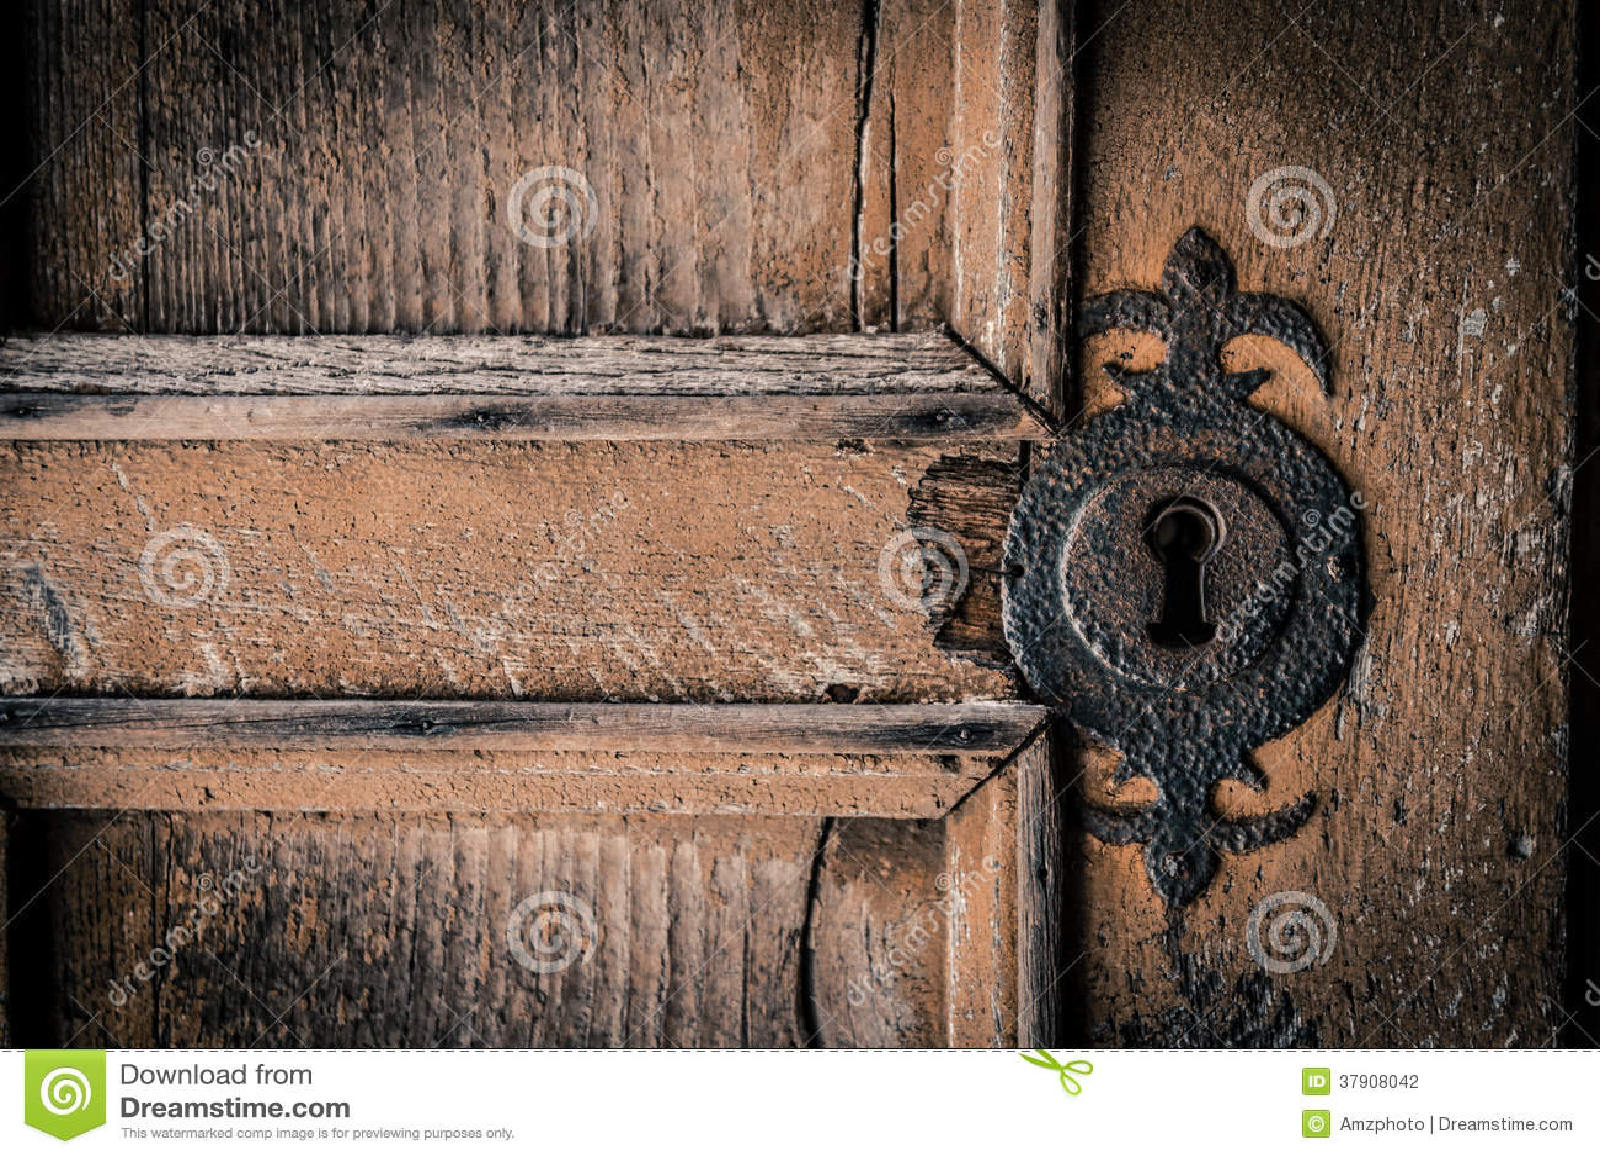 Don T Peek Through The Key Hole Stock Photo Image 37908042